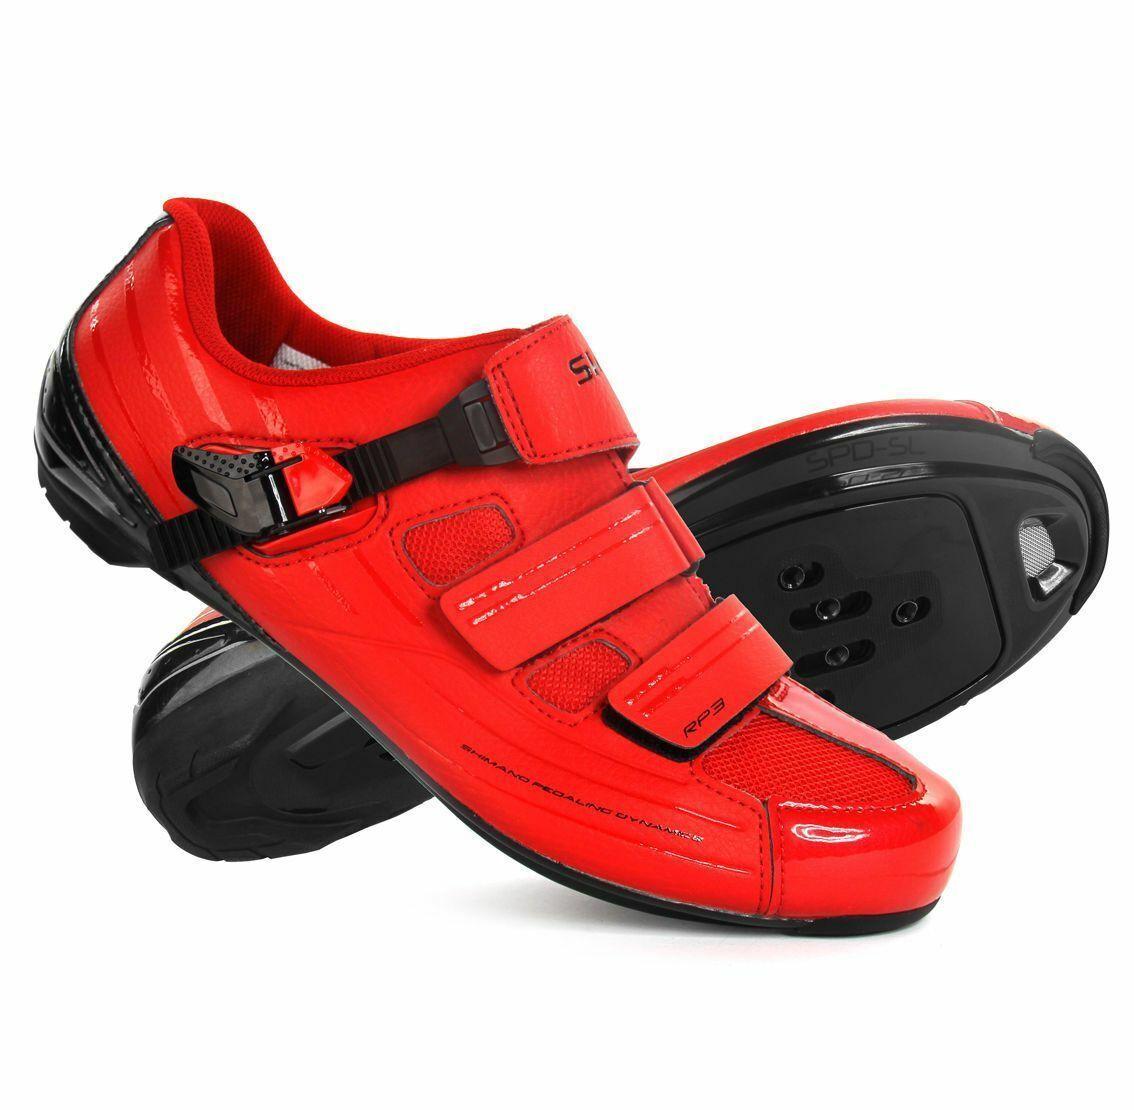 Sautope bici corsa Shiuomoo RP3 rosse rosso strada bicicletta sautope SPD SL 4246